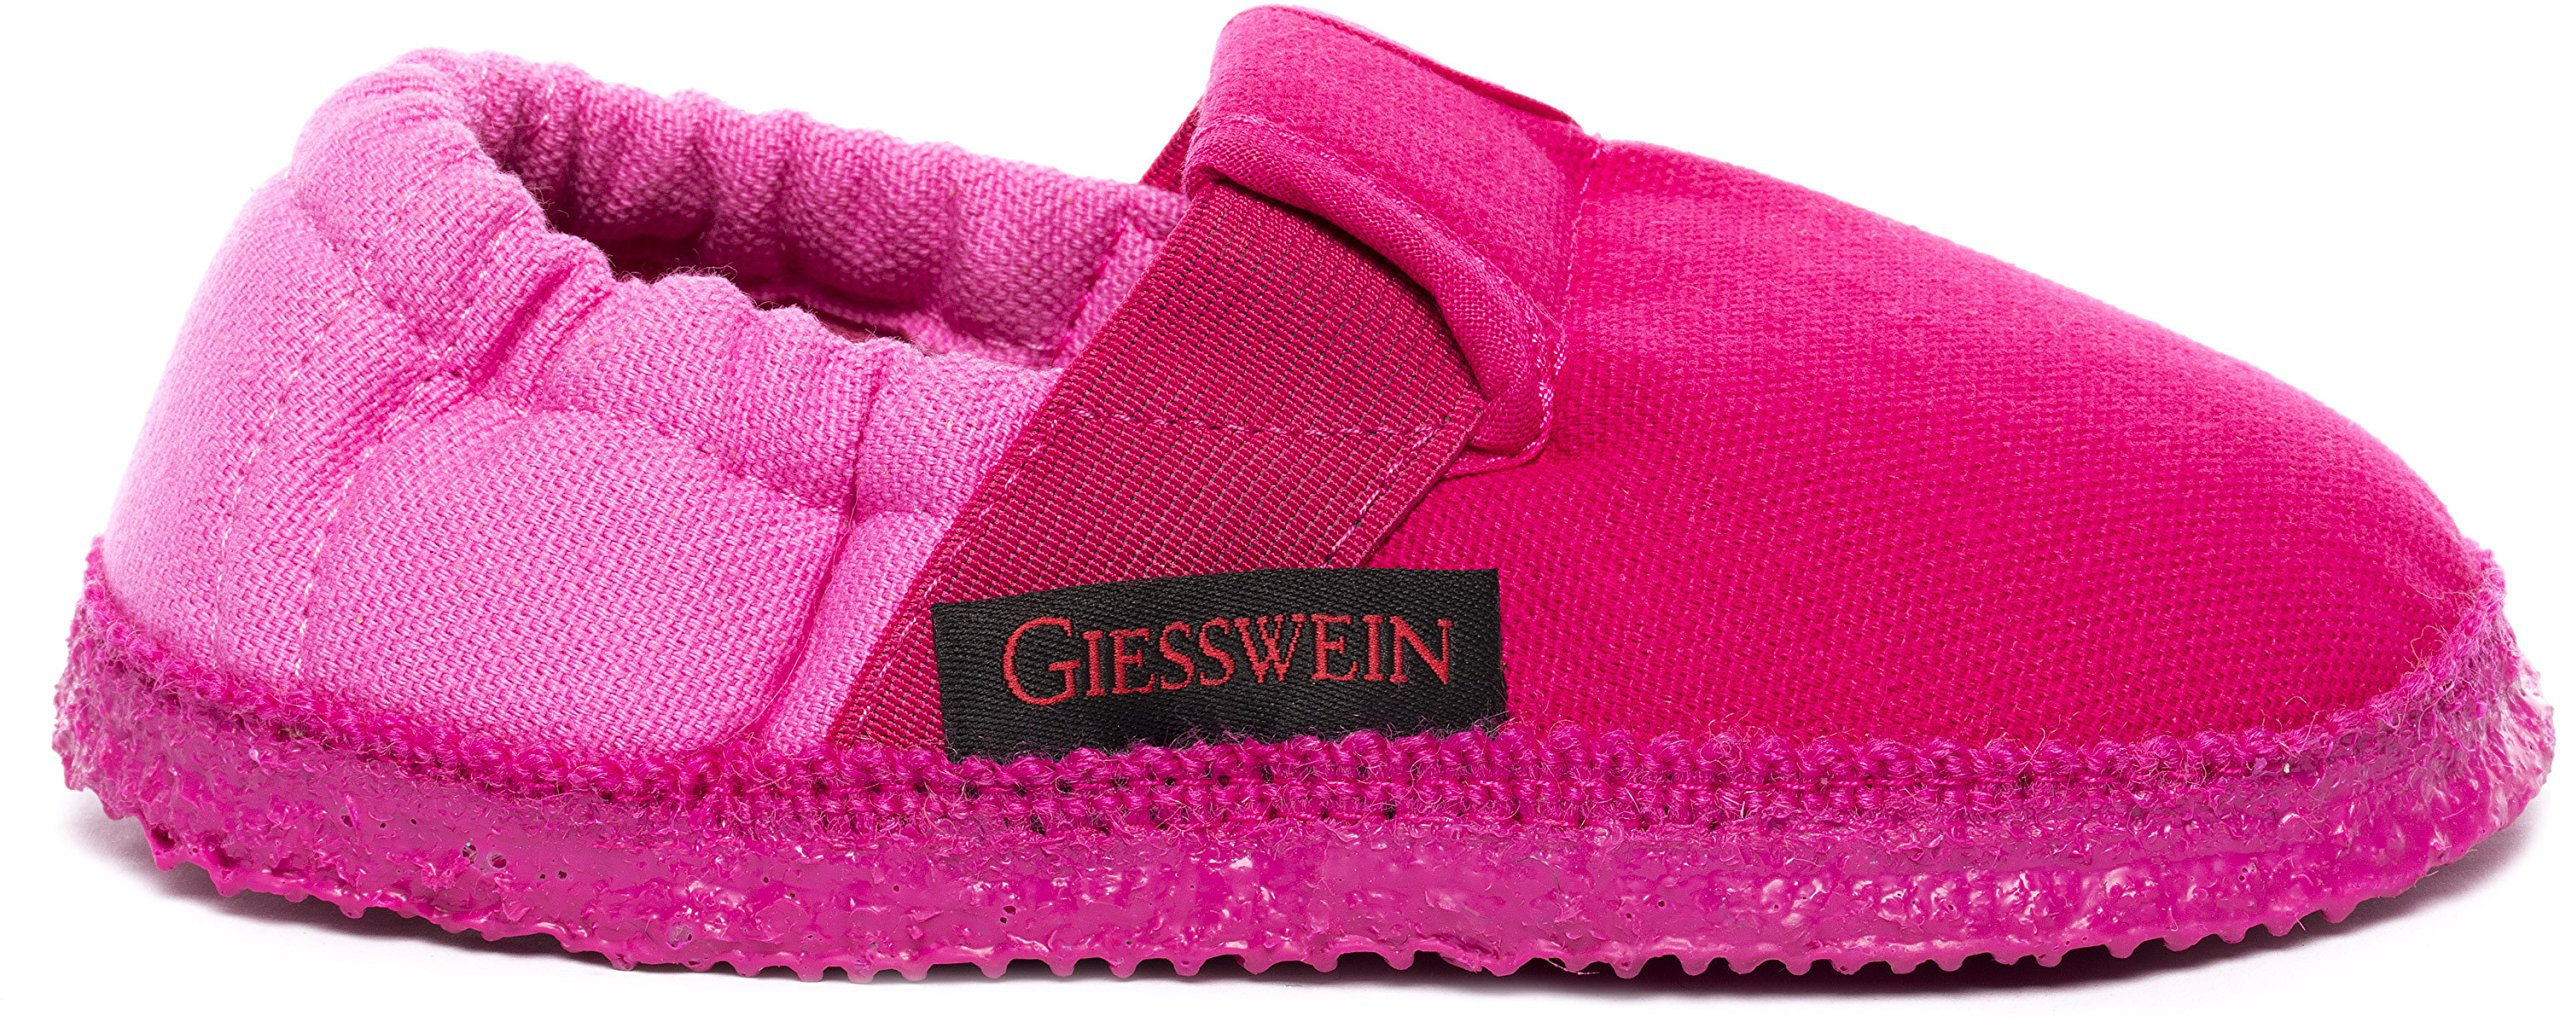 Giesswein Slippers Aichach by Giesswein (Image #5)